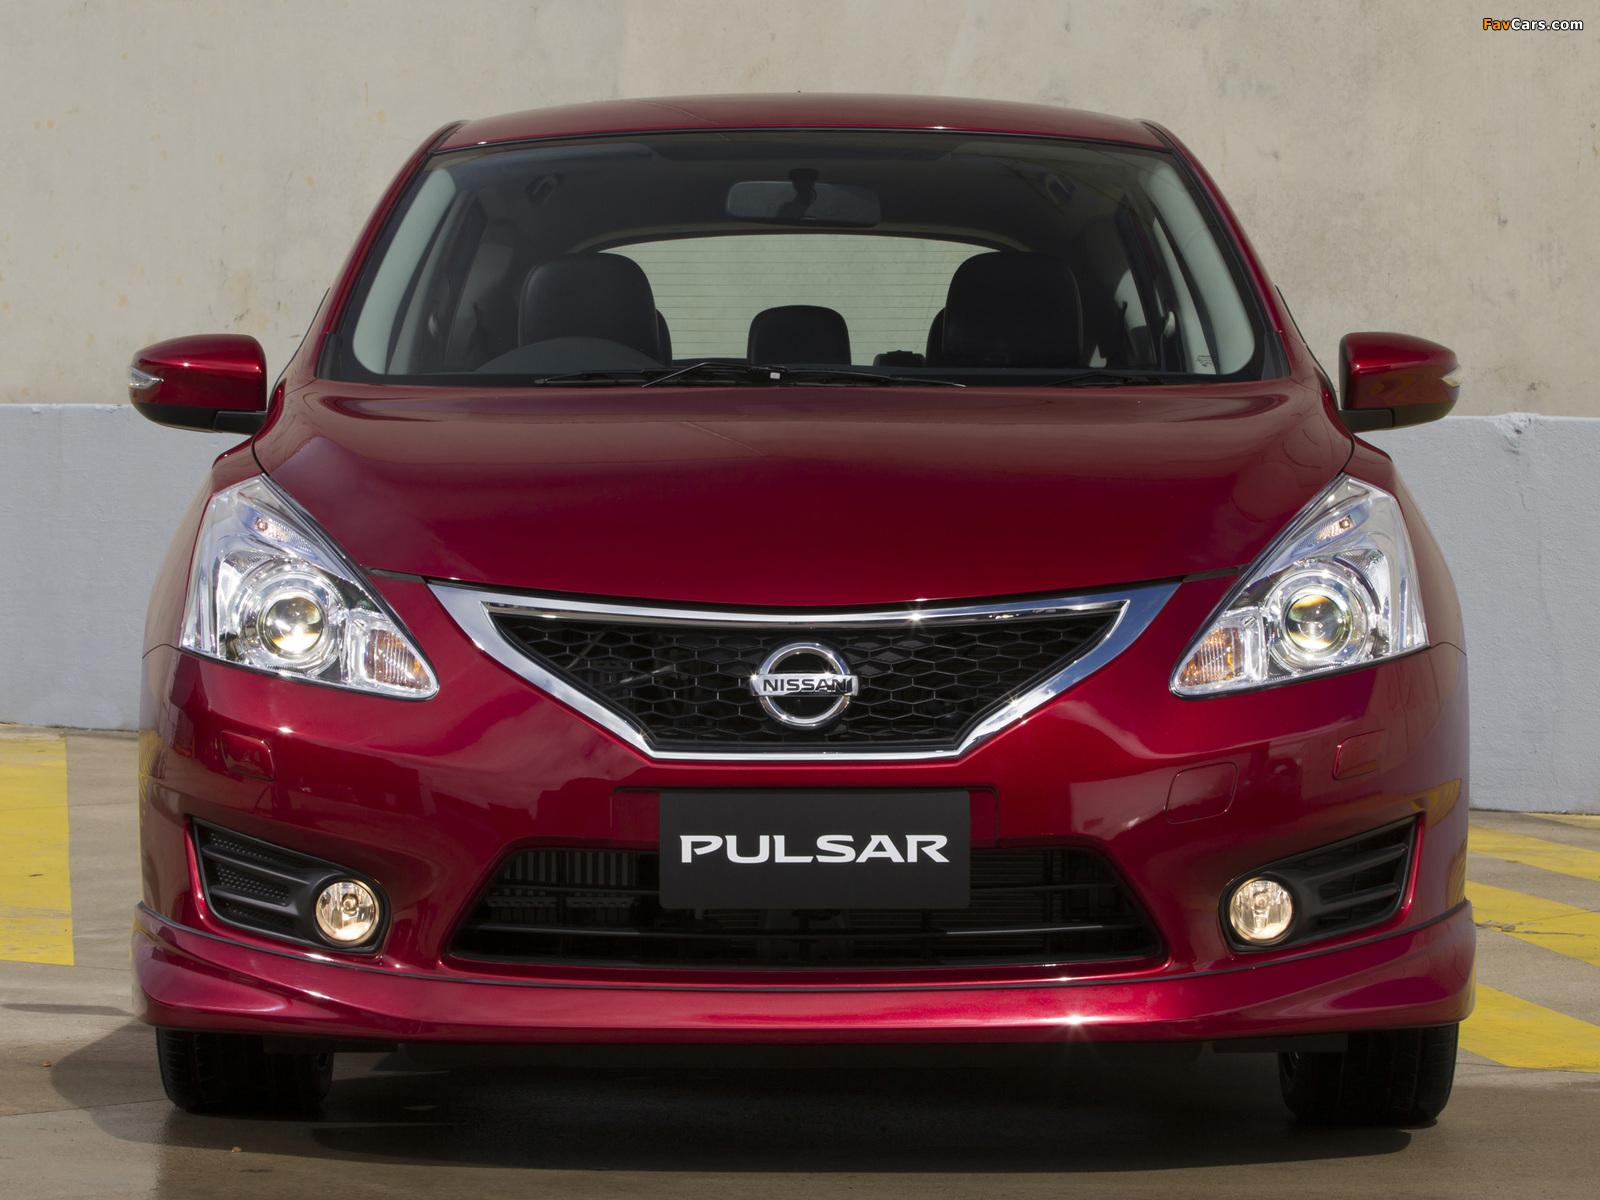 Nissan Pulsar SSS (NB17) 2013 photos (1600 x 1200)